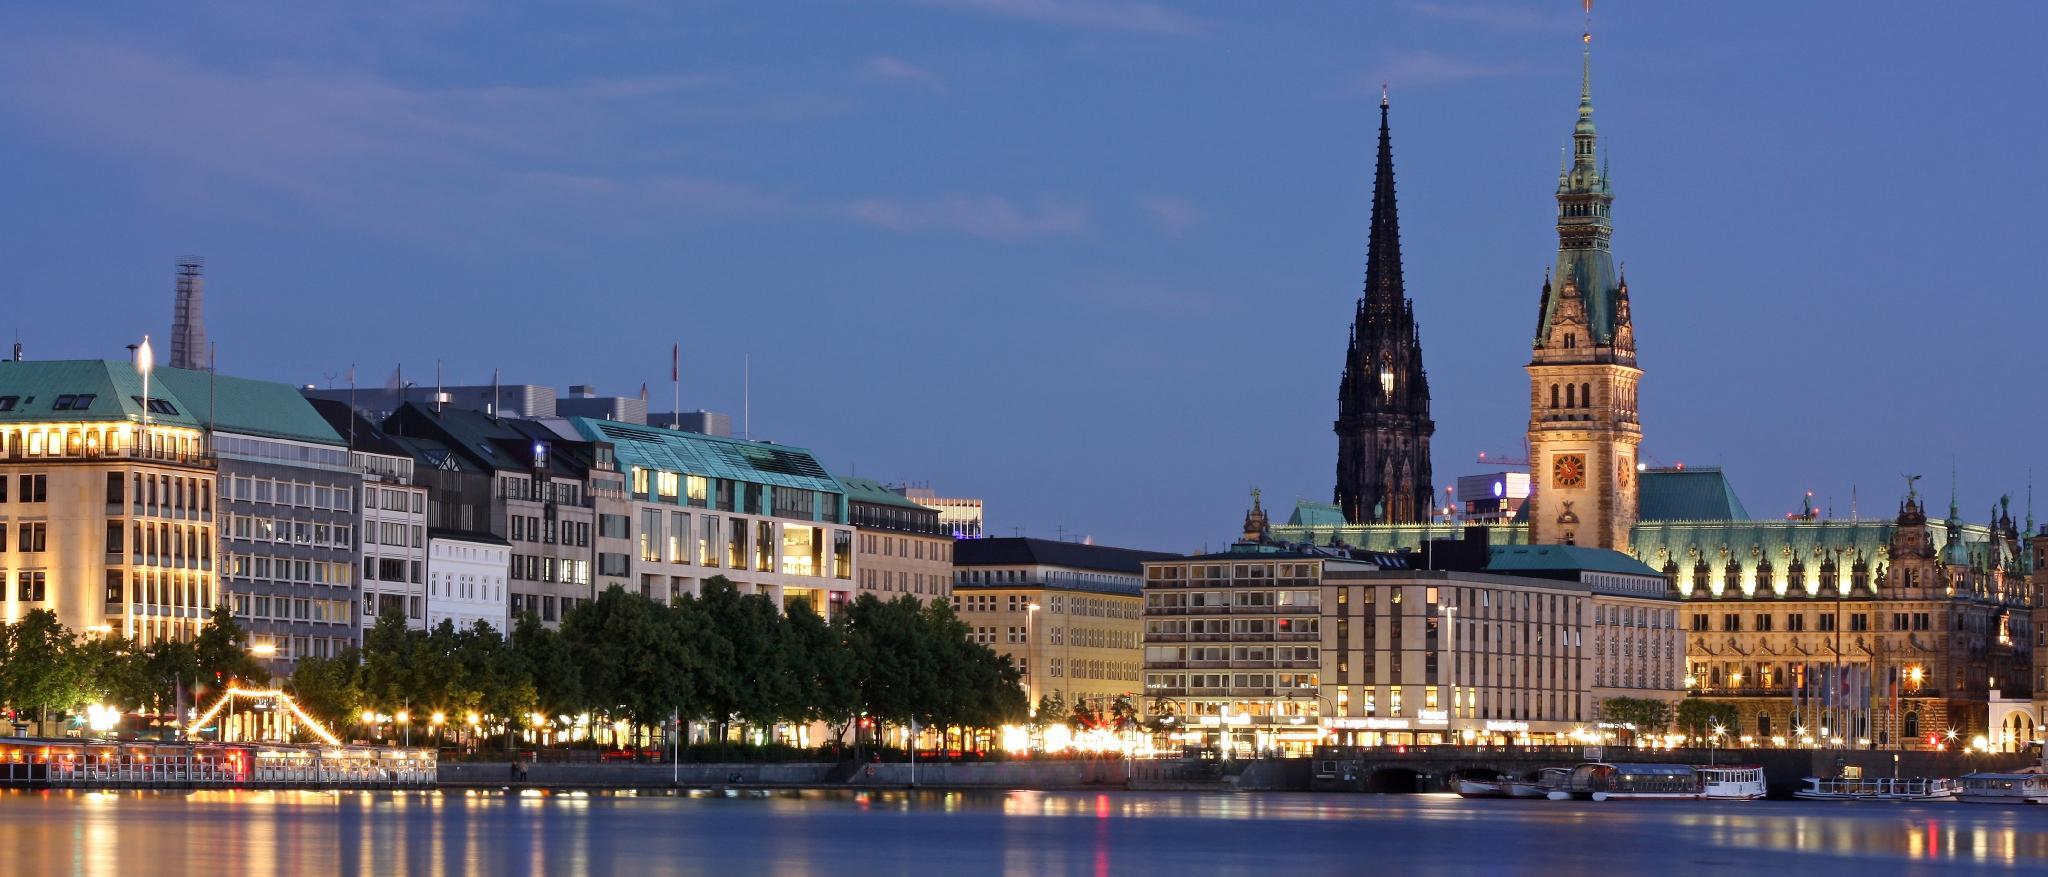 430 hotels hamburg top hotelangebote exklusiv bei